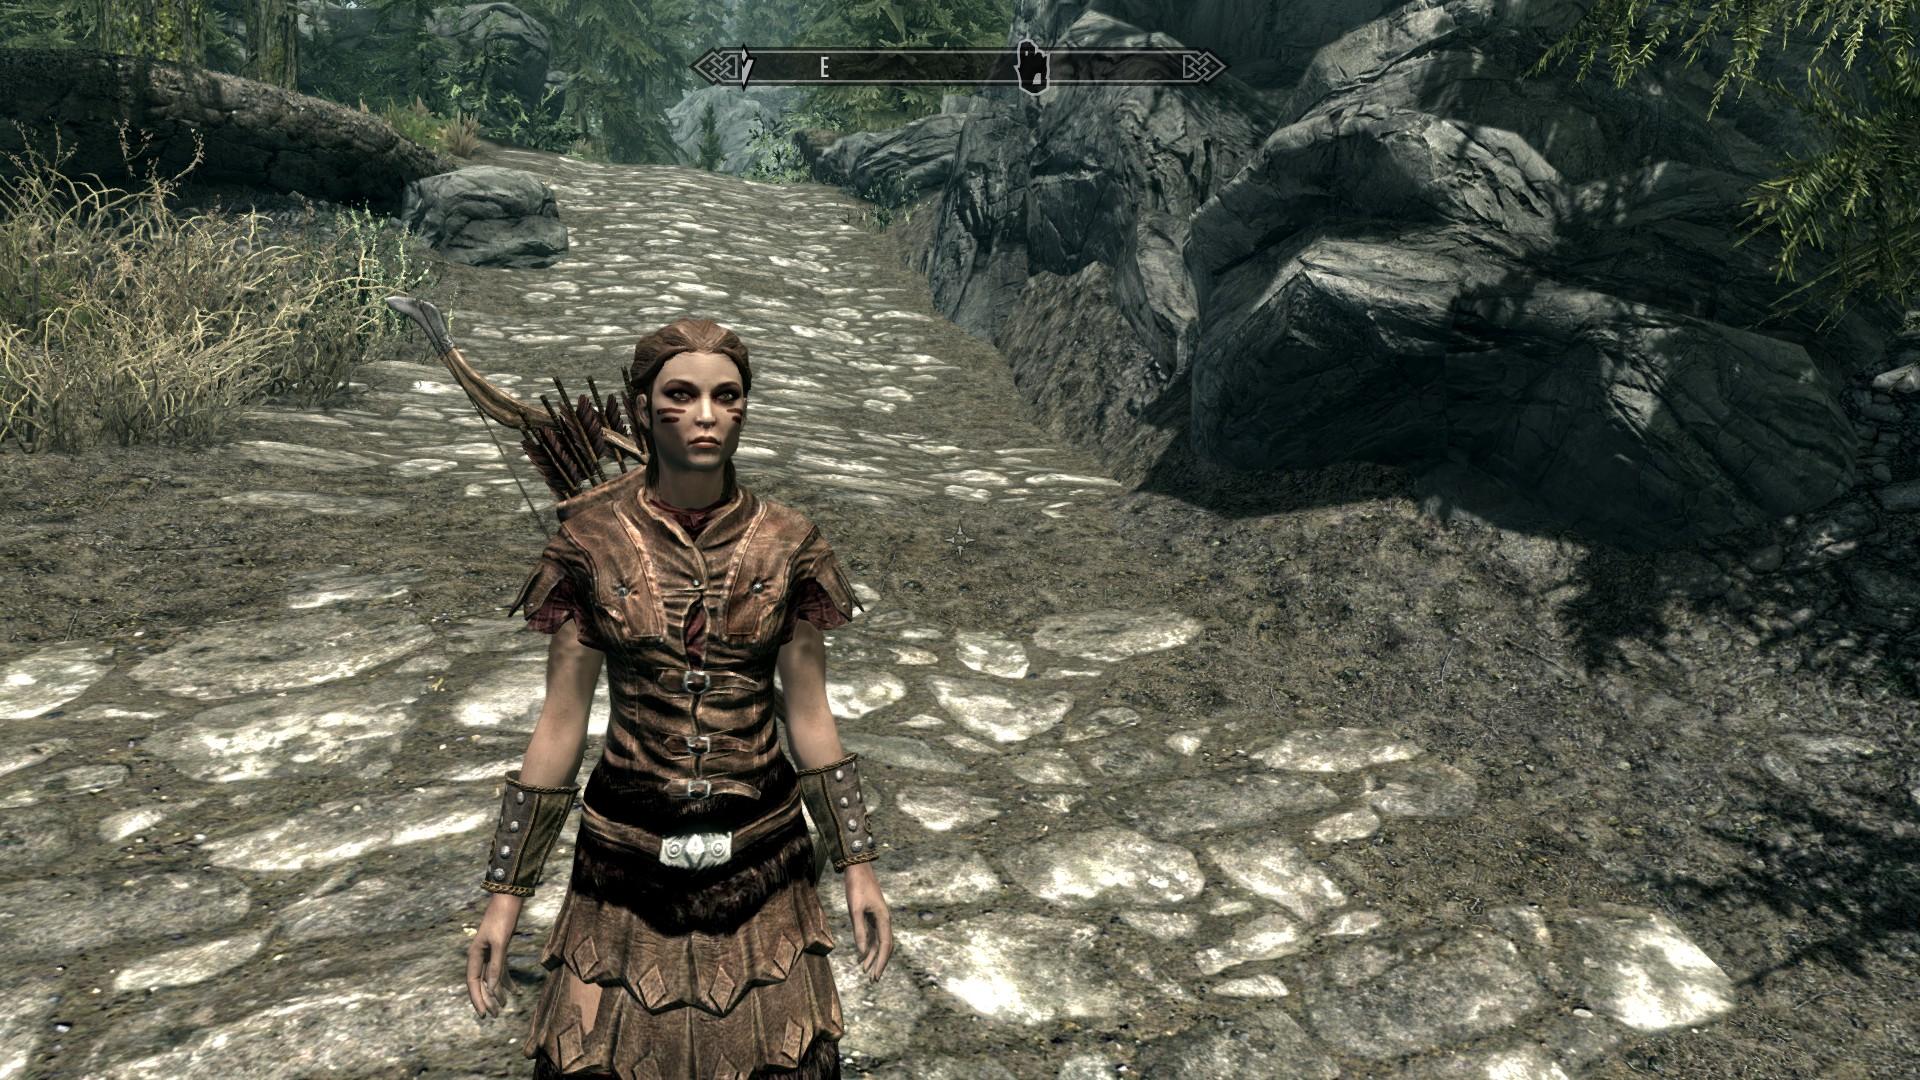 The Elder Scrolls V: Skyrim (Video Game 2011) - Photo